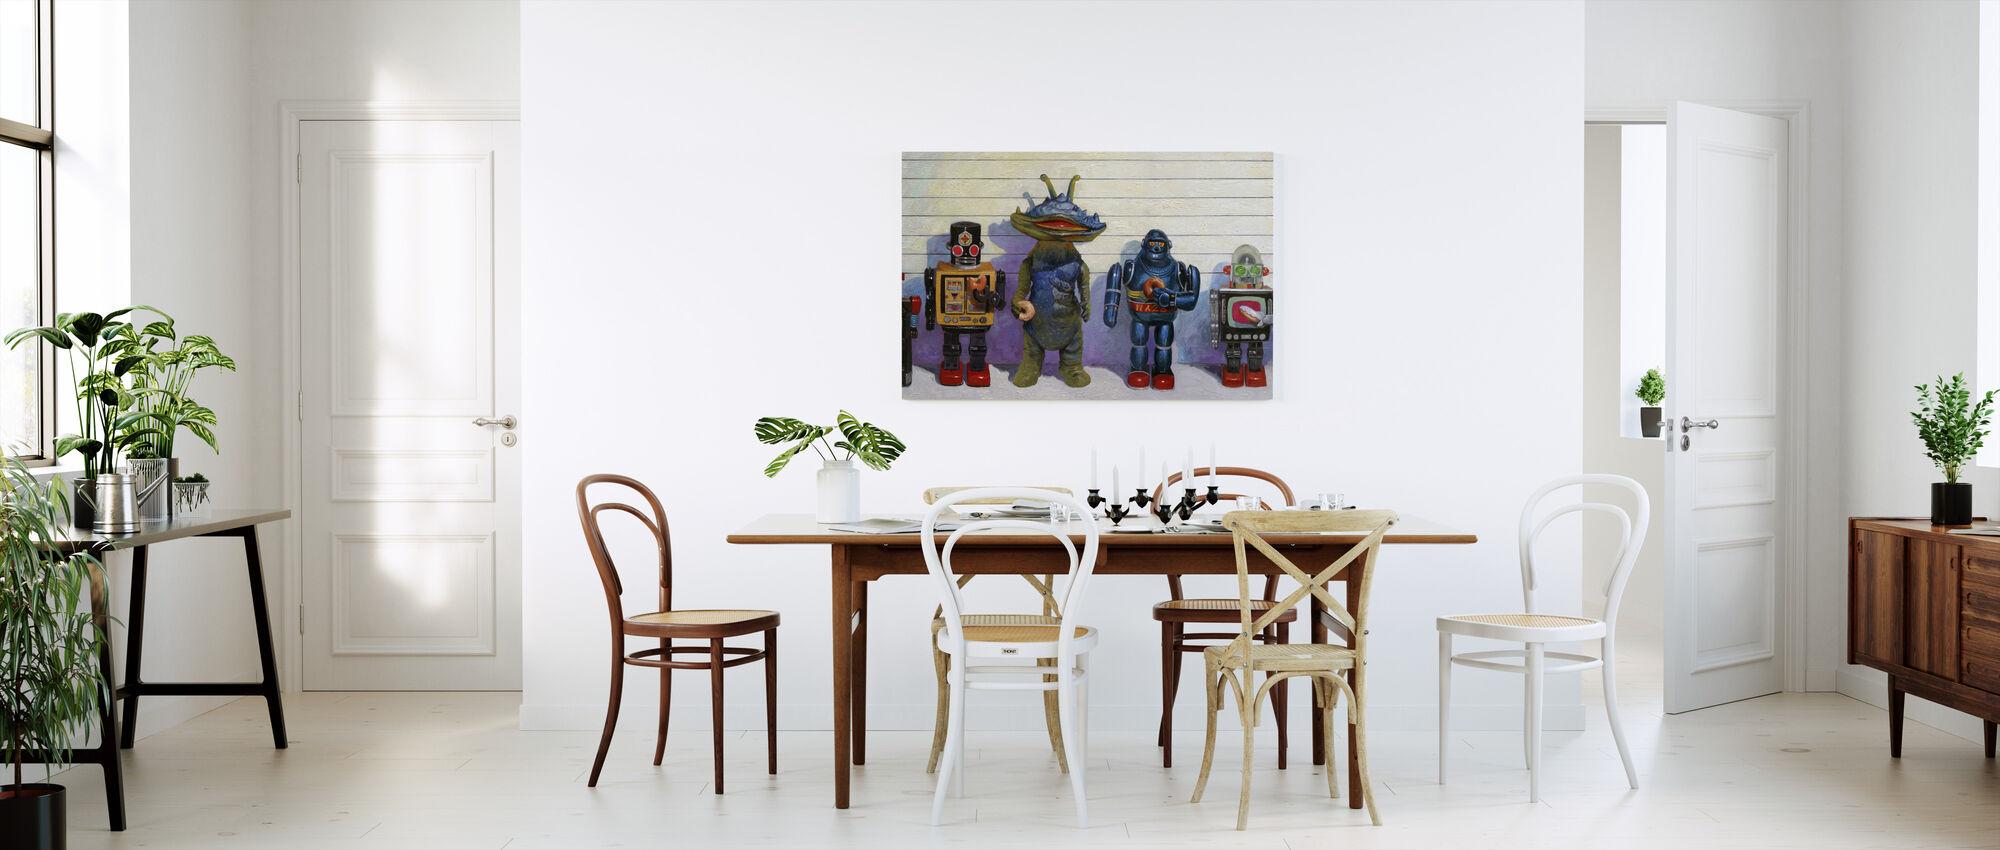 Line Up - Canvas print - Kitchen